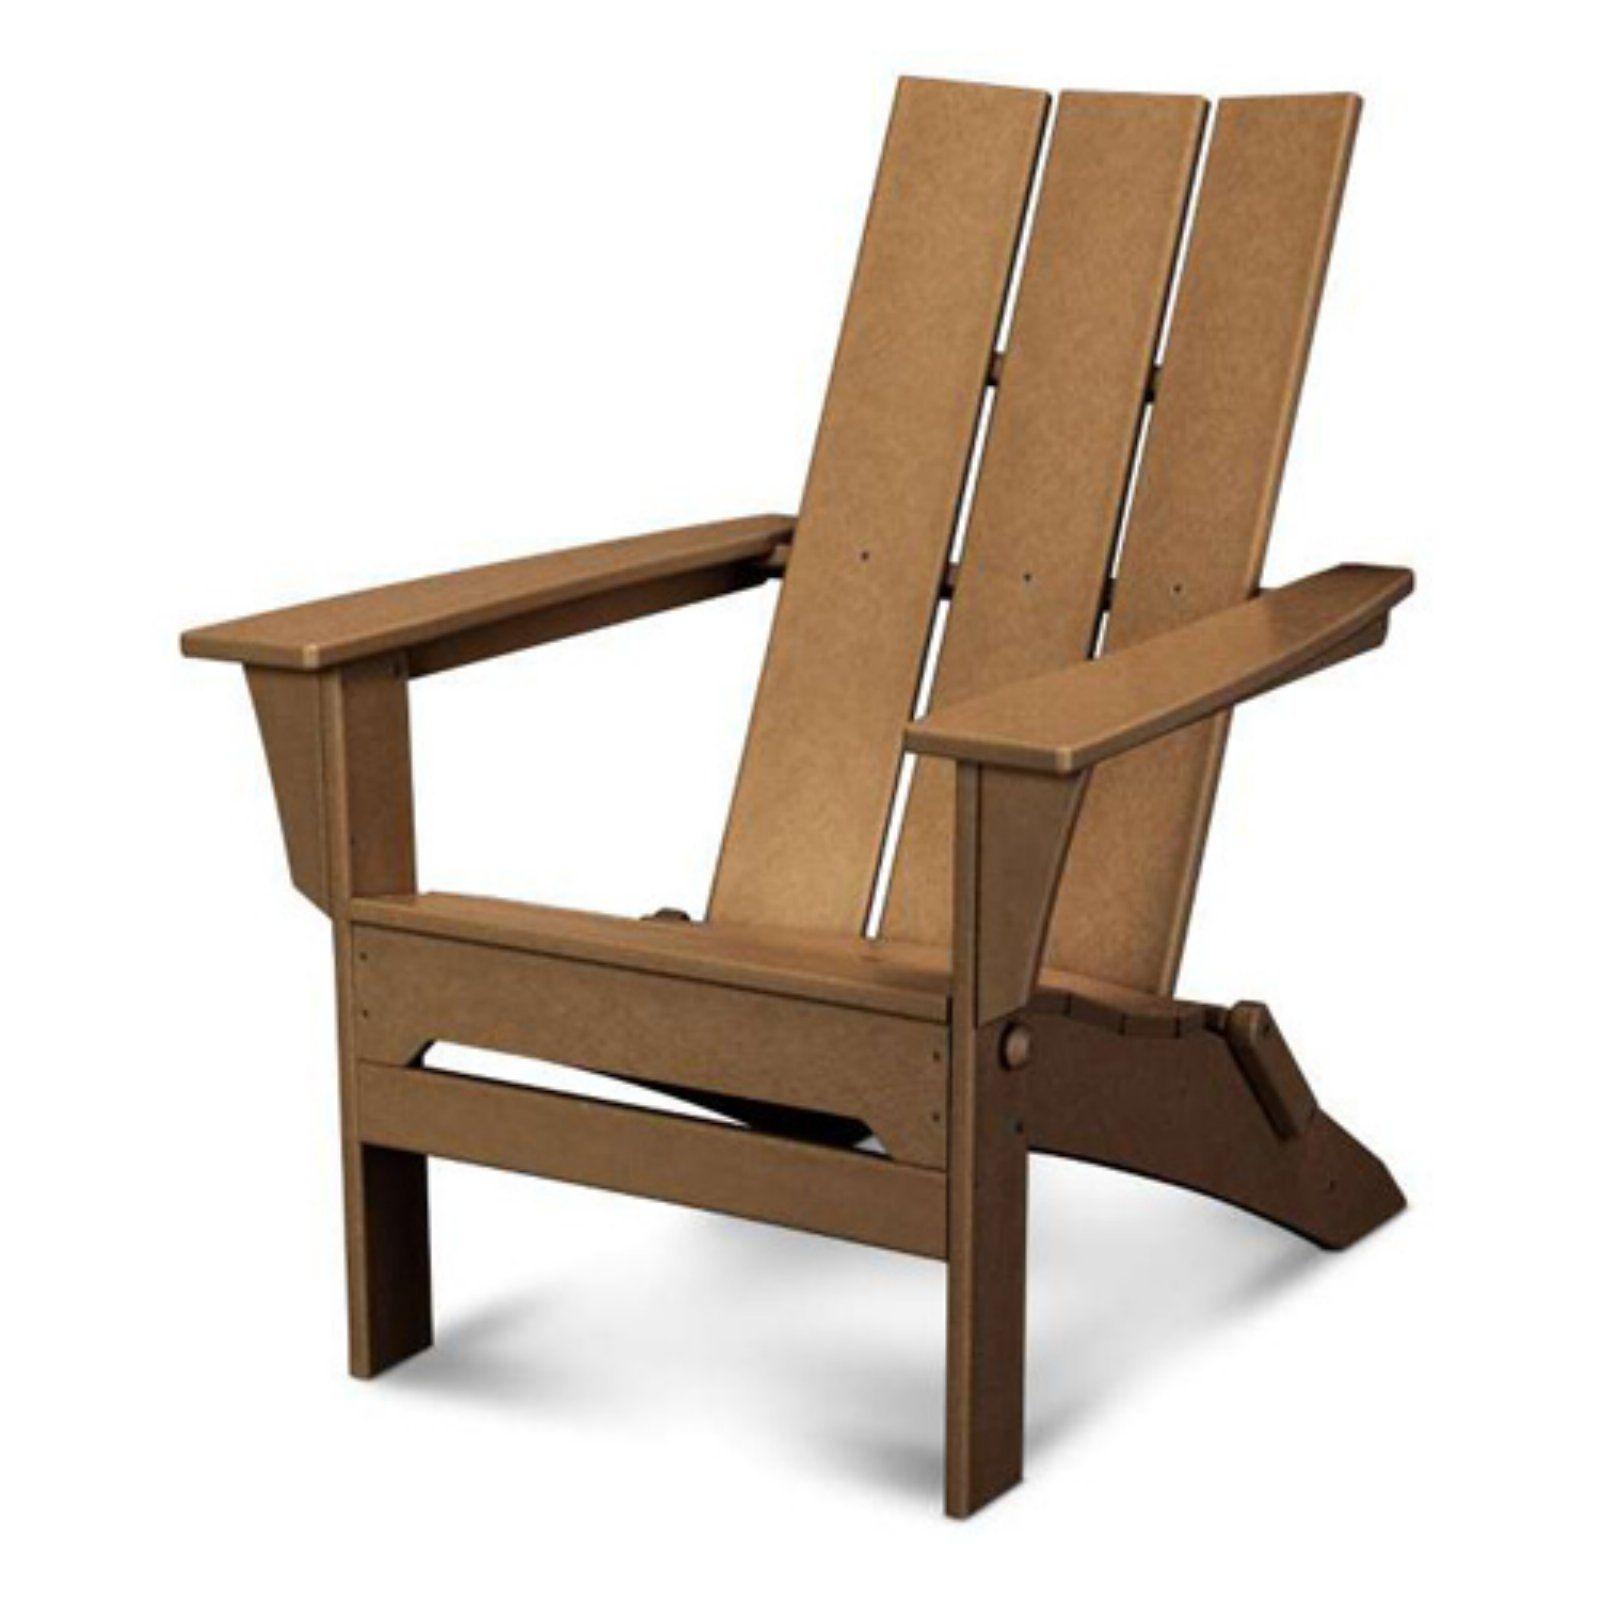 Outdoor POLYWOOD® Modern Folding Adirondack Chair Teak